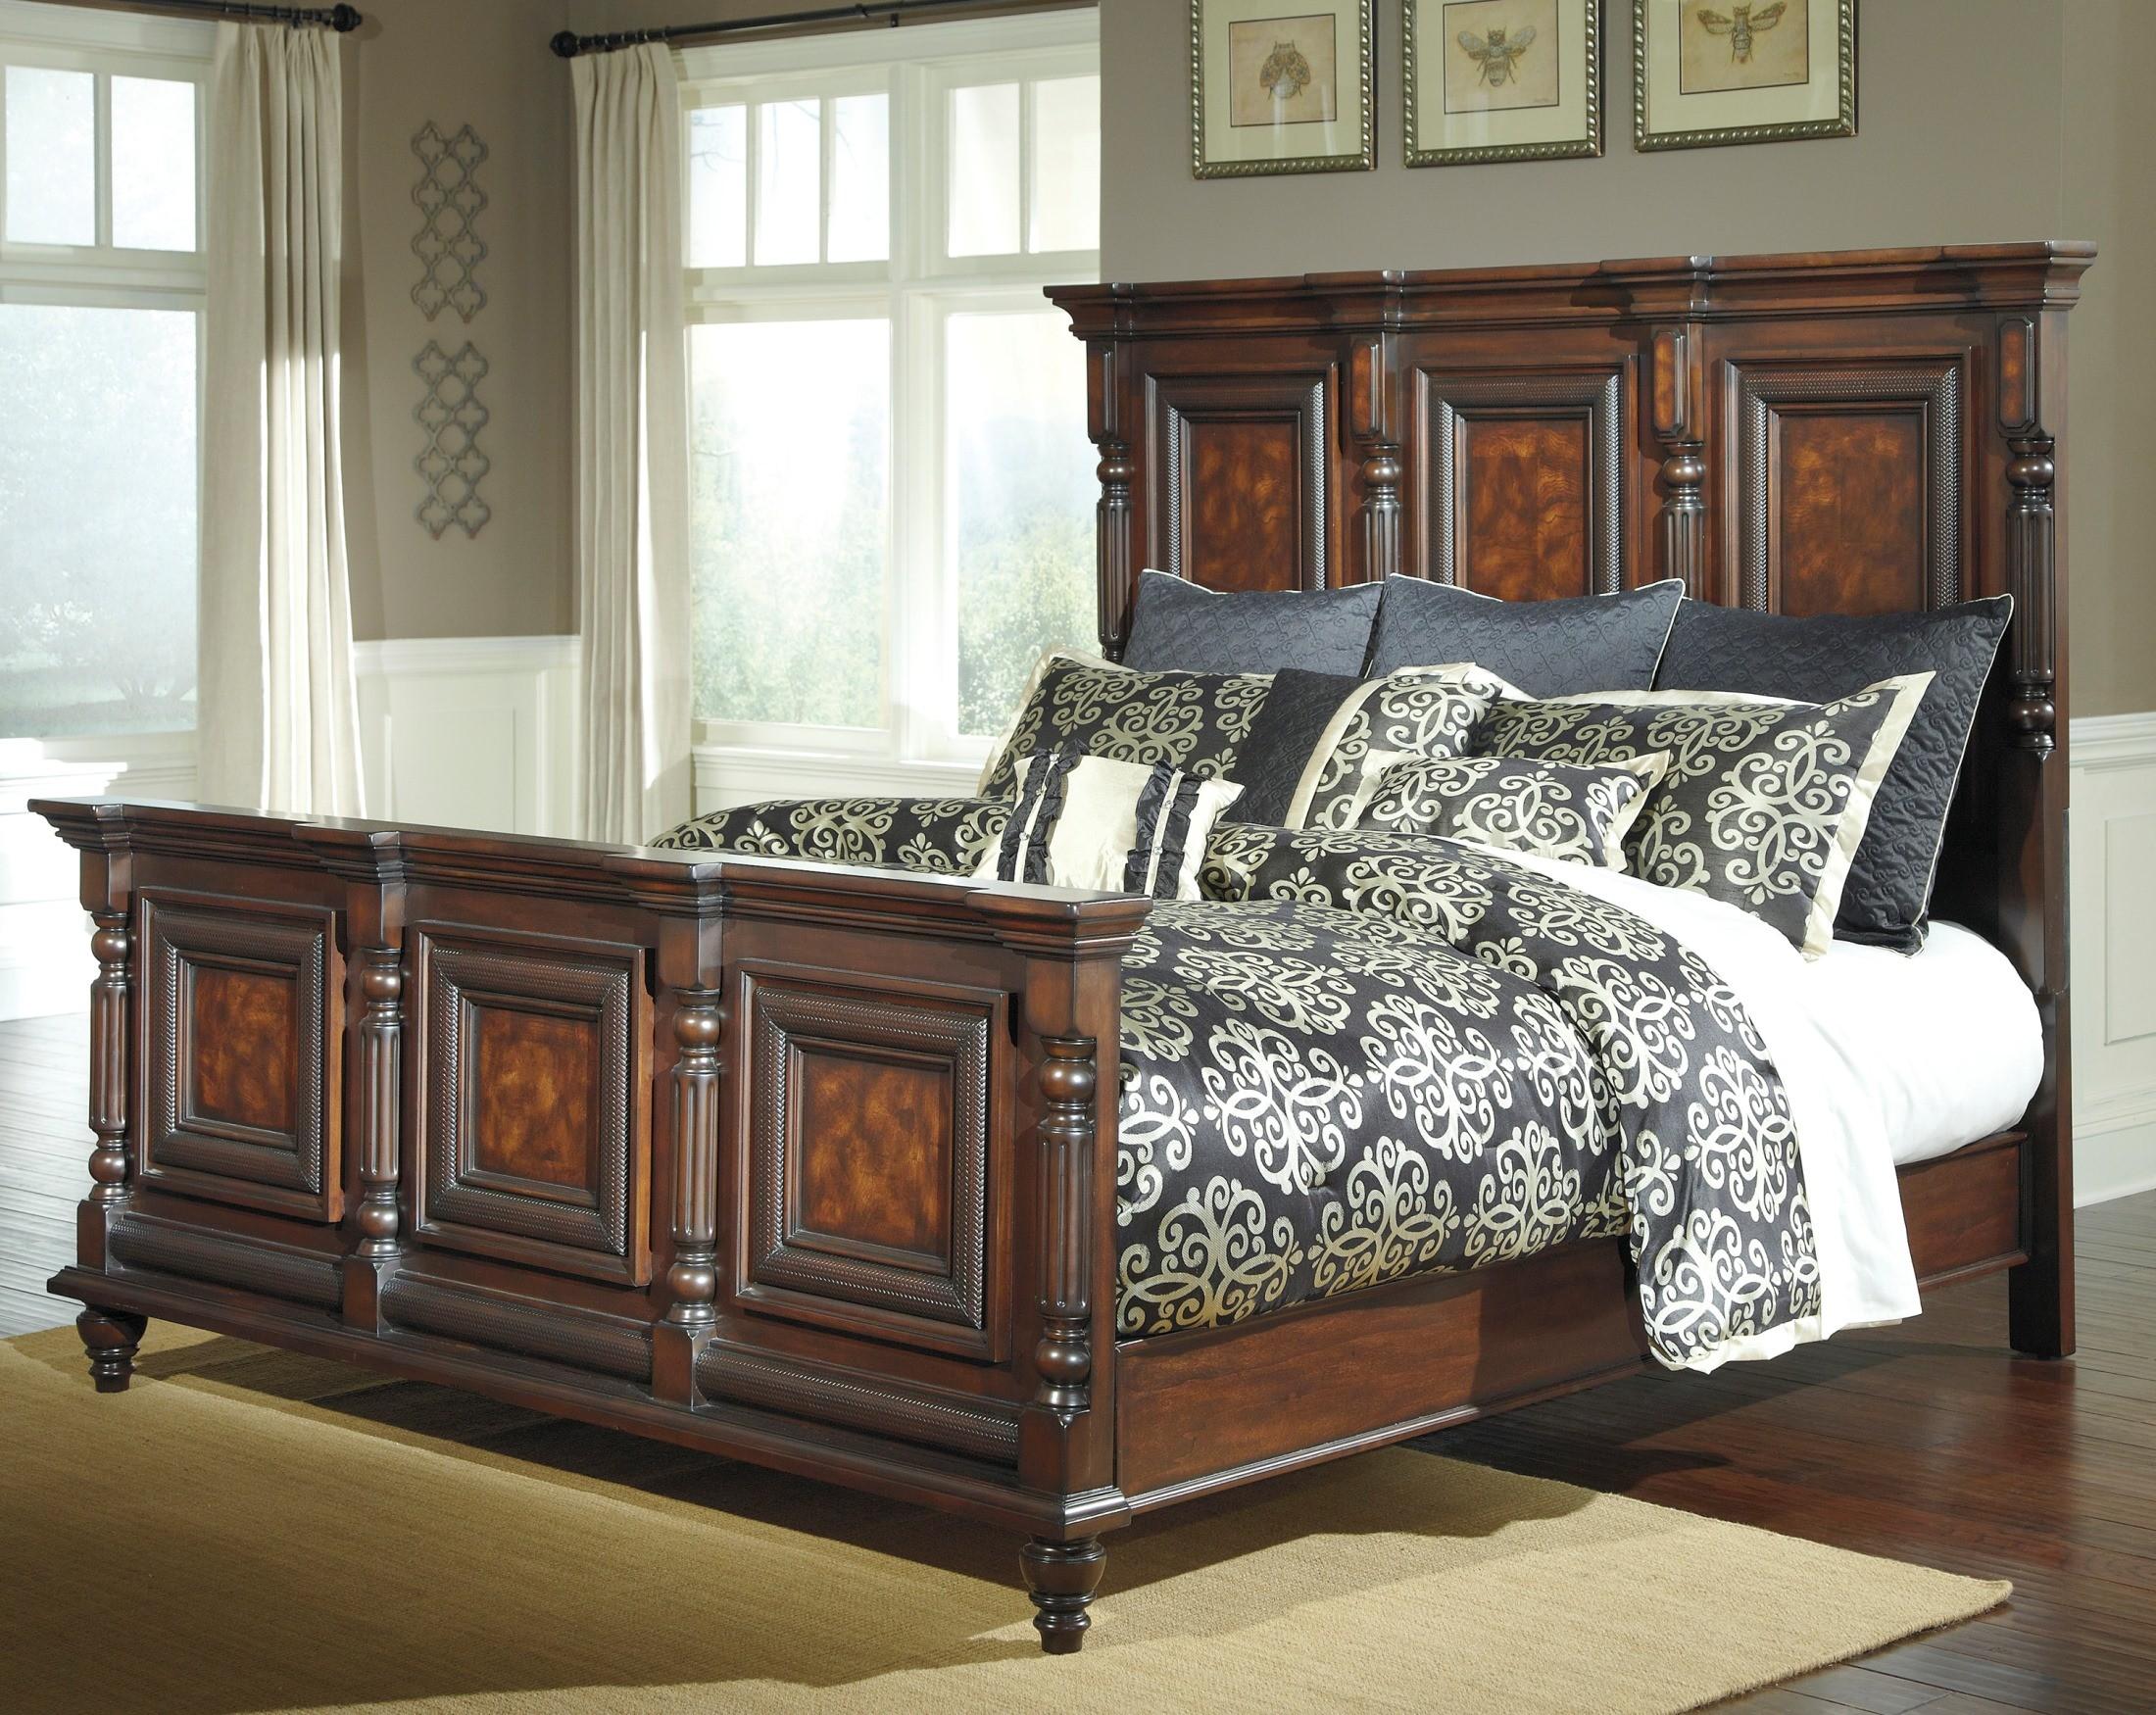 Key town asl b668 158 156 94 ashley furniture for Ashley furniture key town bedroom set